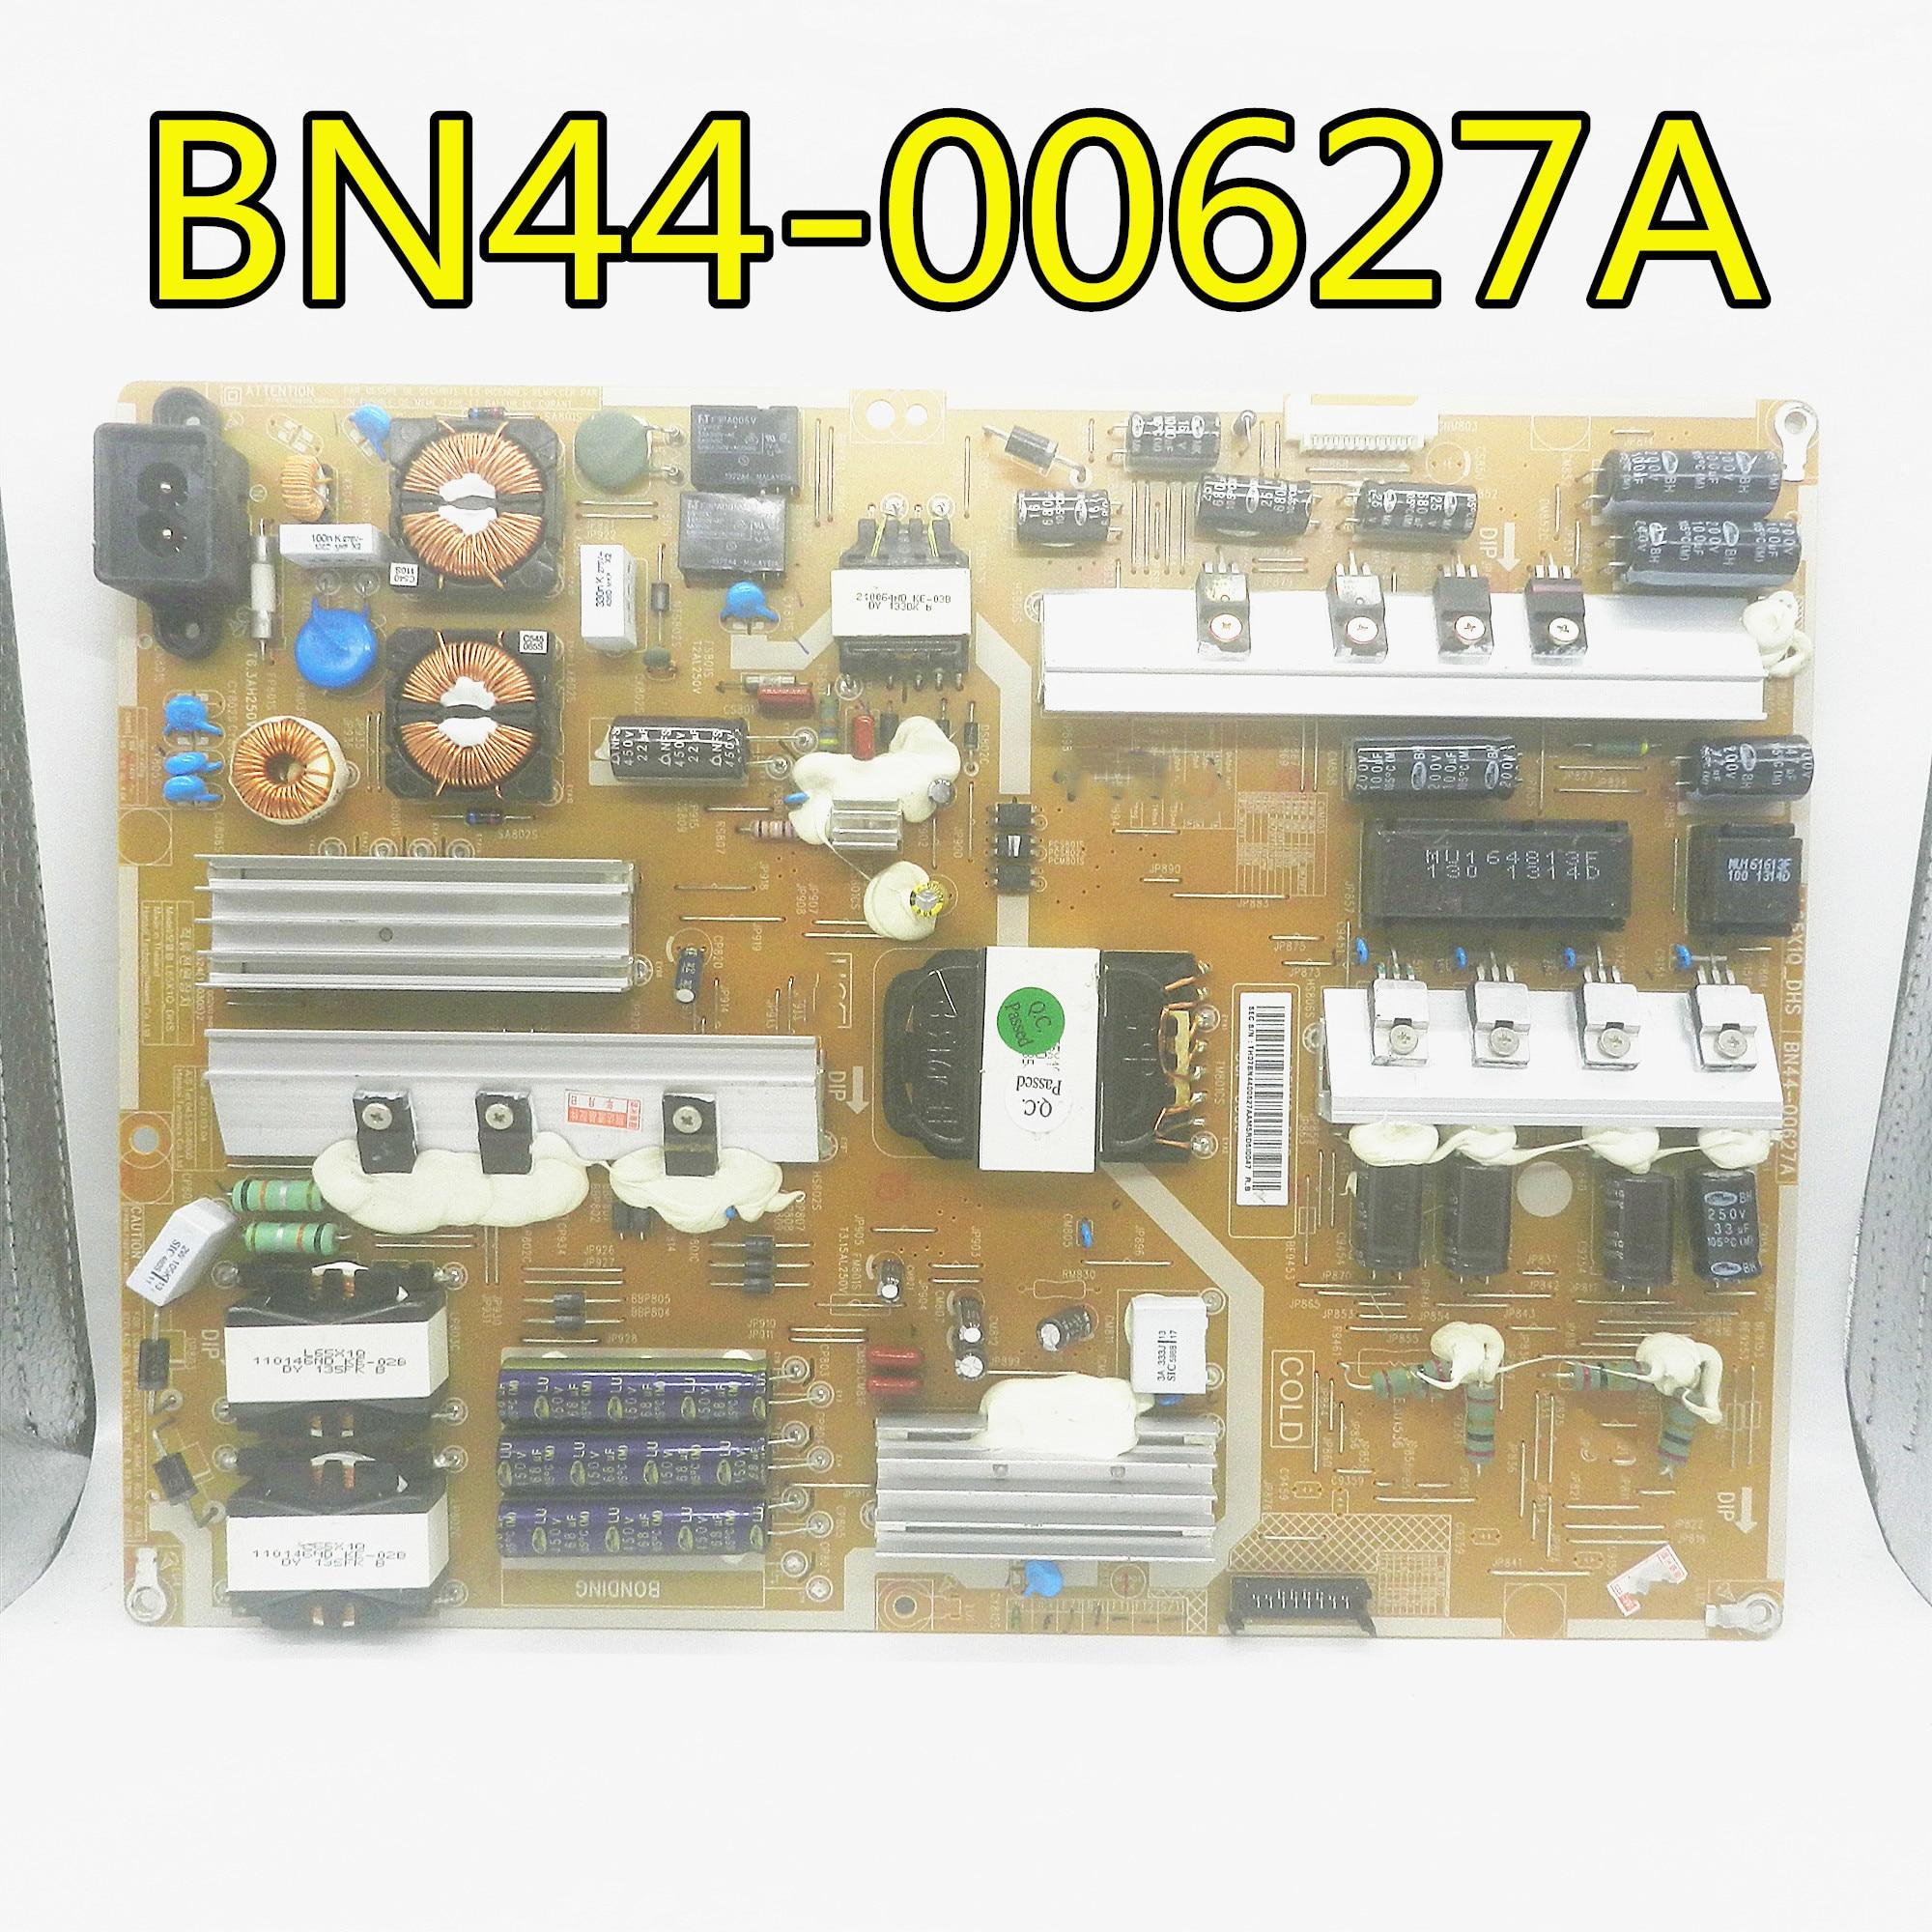 original 100% test for samgsung UA65F6400EJ BN44-00627A L65X1Q-DHS power boardoriginal 100% test for samgsung UA65F6400EJ BN44-00627A L65X1Q-DHS power board